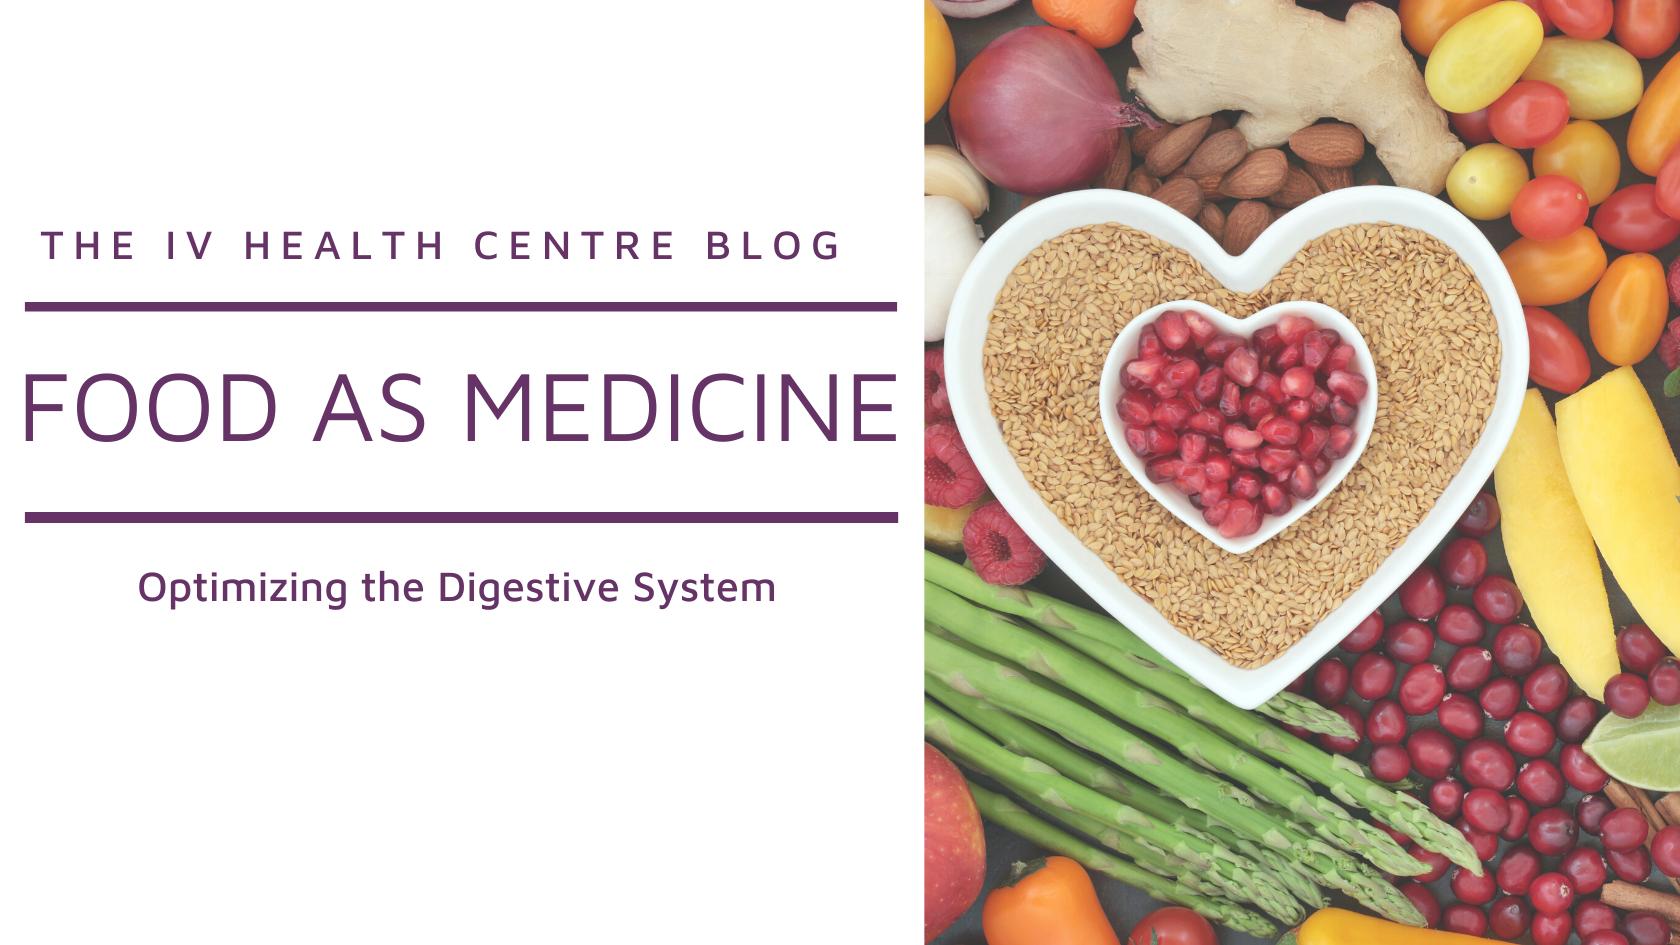 Food as Medicine: Optimizing Digestion